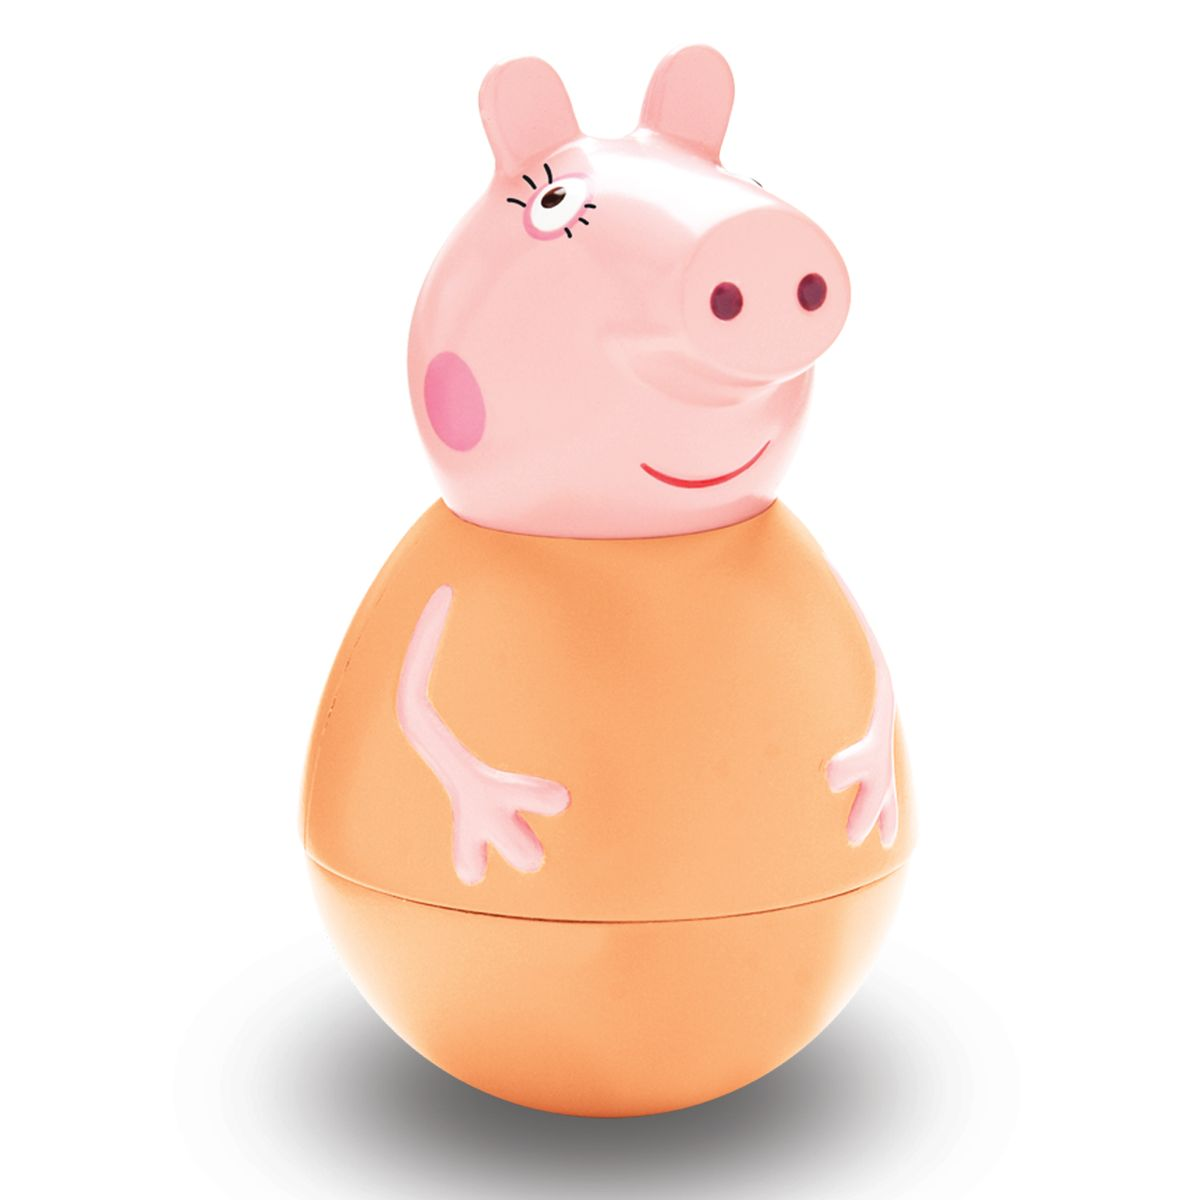 все цены на Peppa Pig Неваляшка Мама Пеппы онлайн